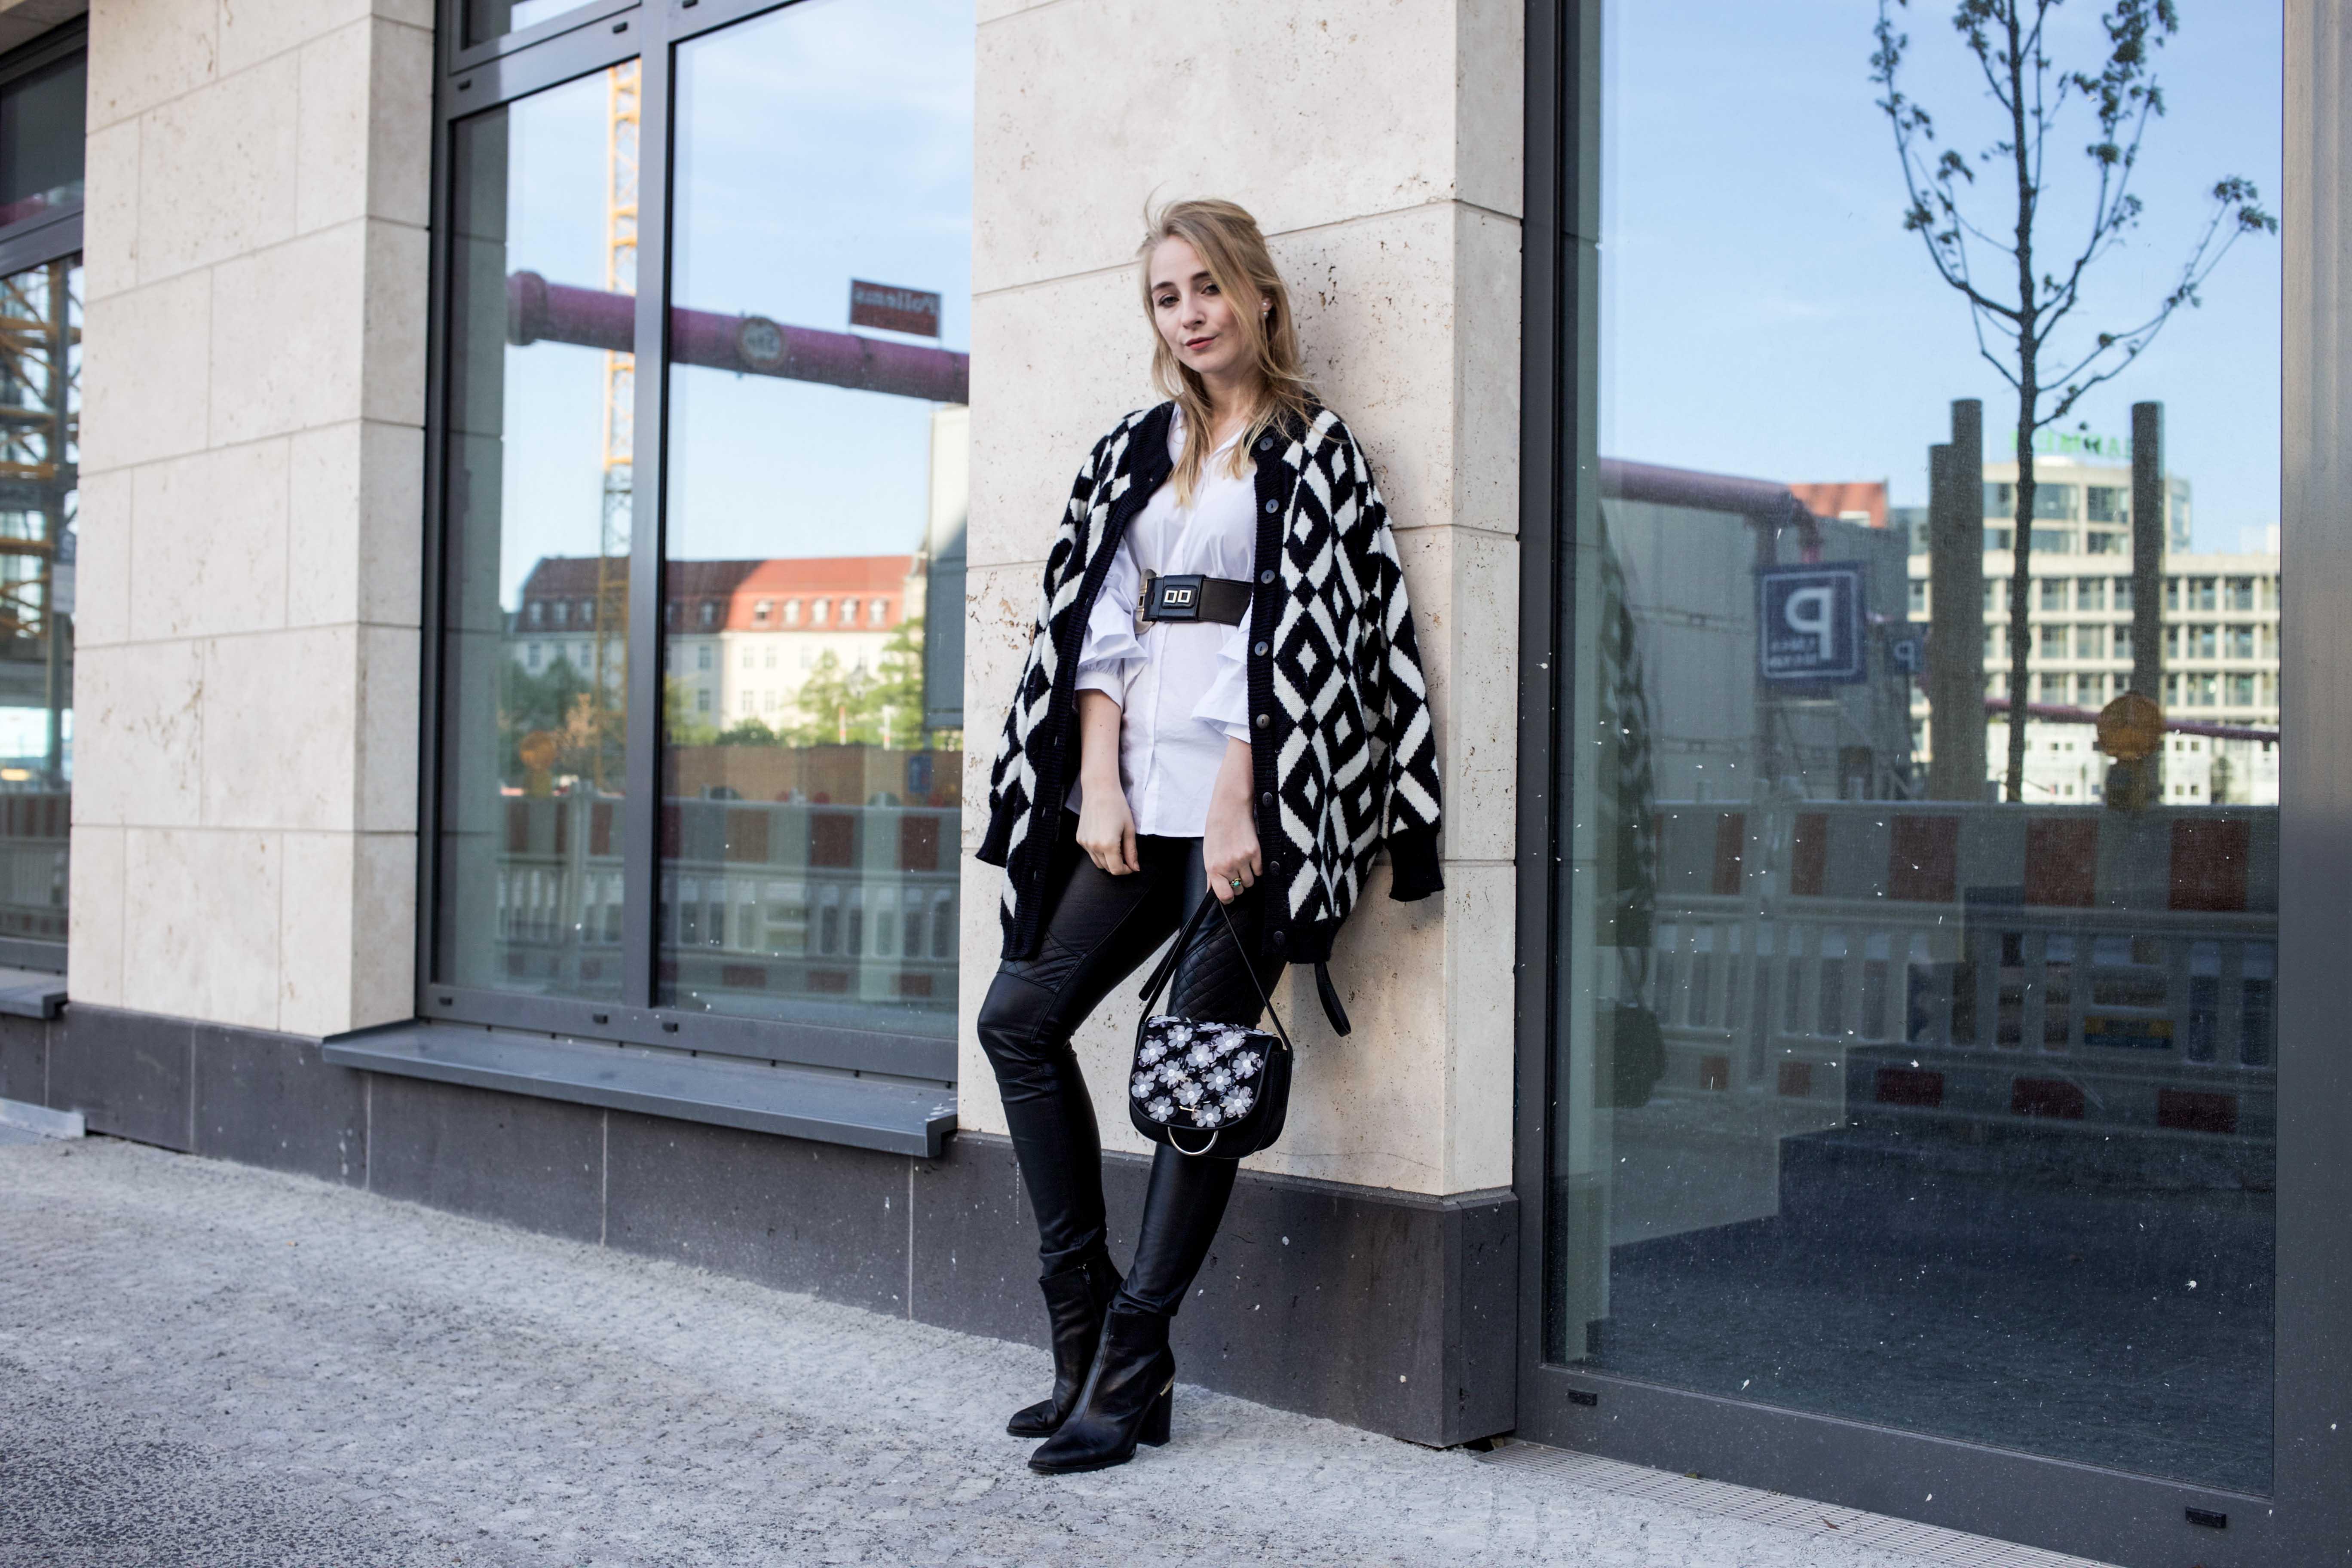 trendreport-weiße-bluse-trompetenärmel-fashionblog-ootd-modeblog-berlin_8803